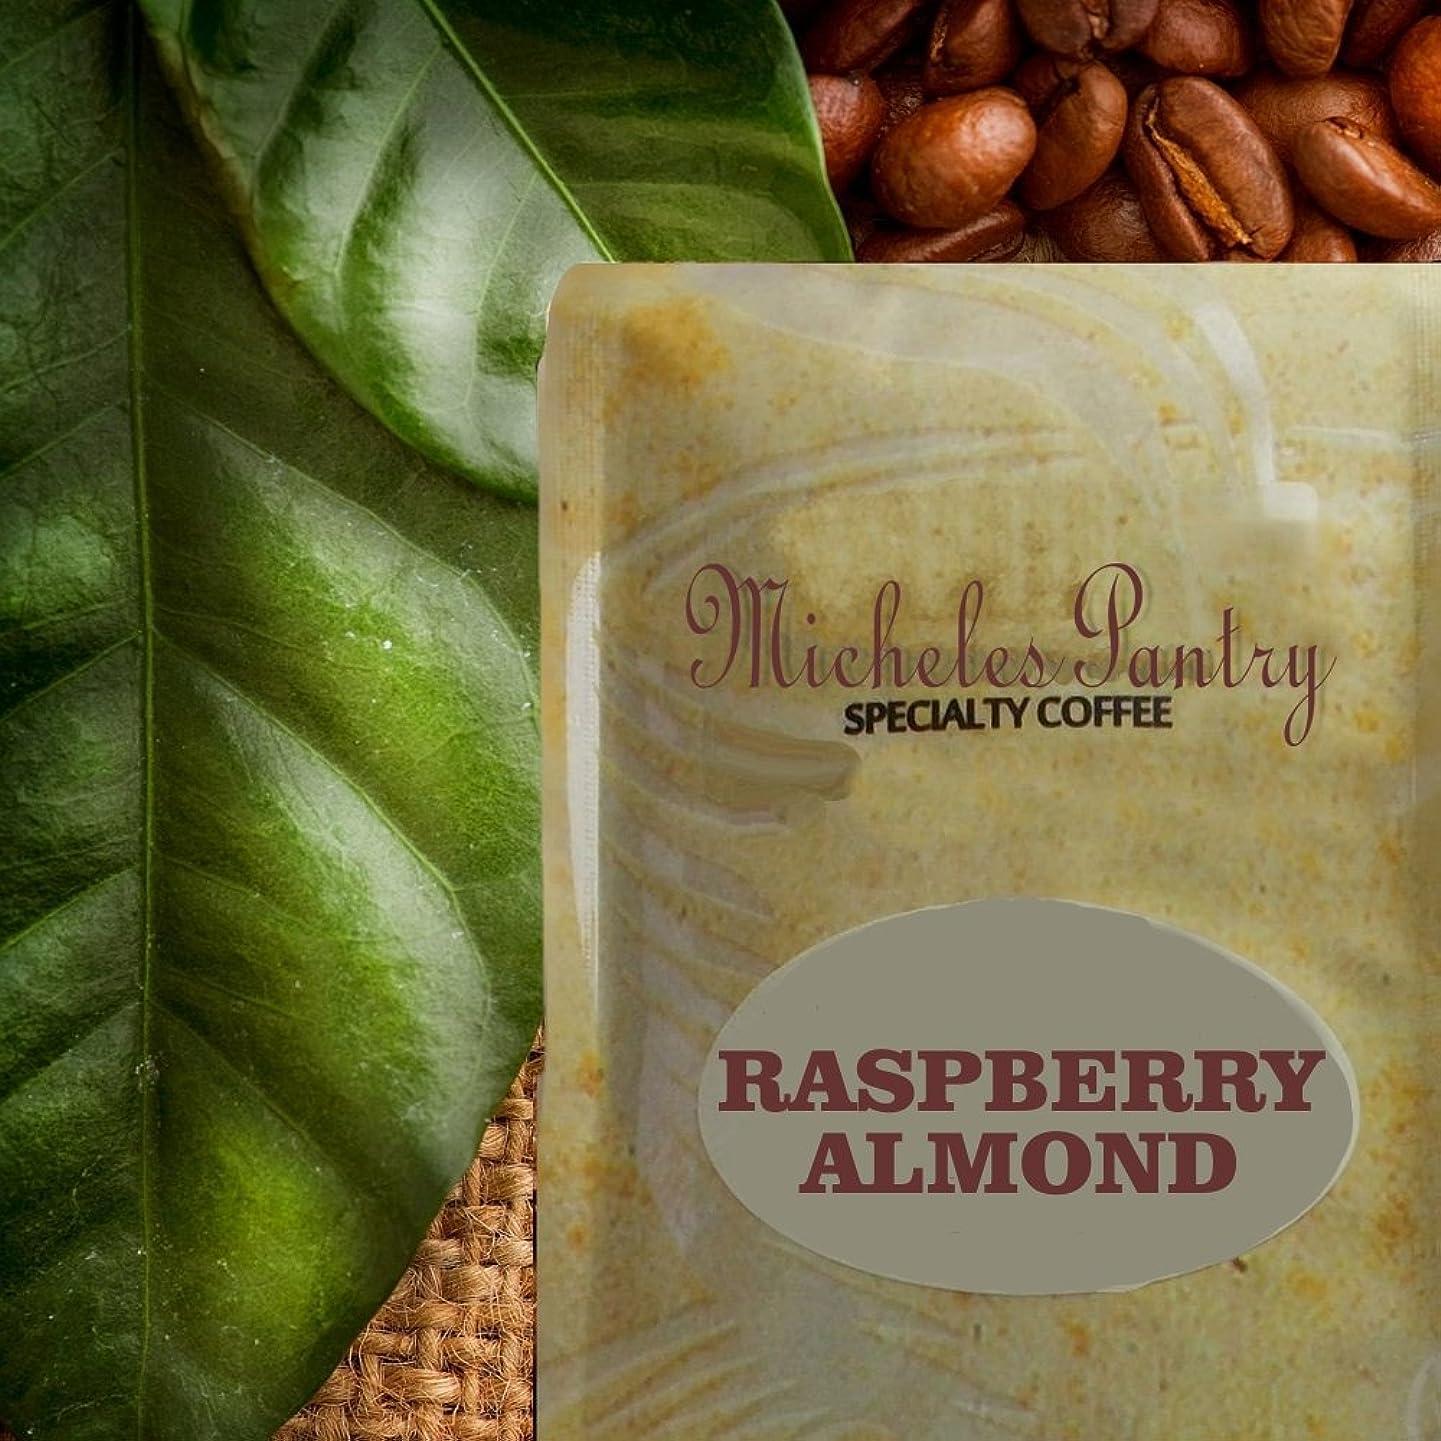 Raspberry Almond Flavored Coffee 2 10 oz. Bags Ground Drip